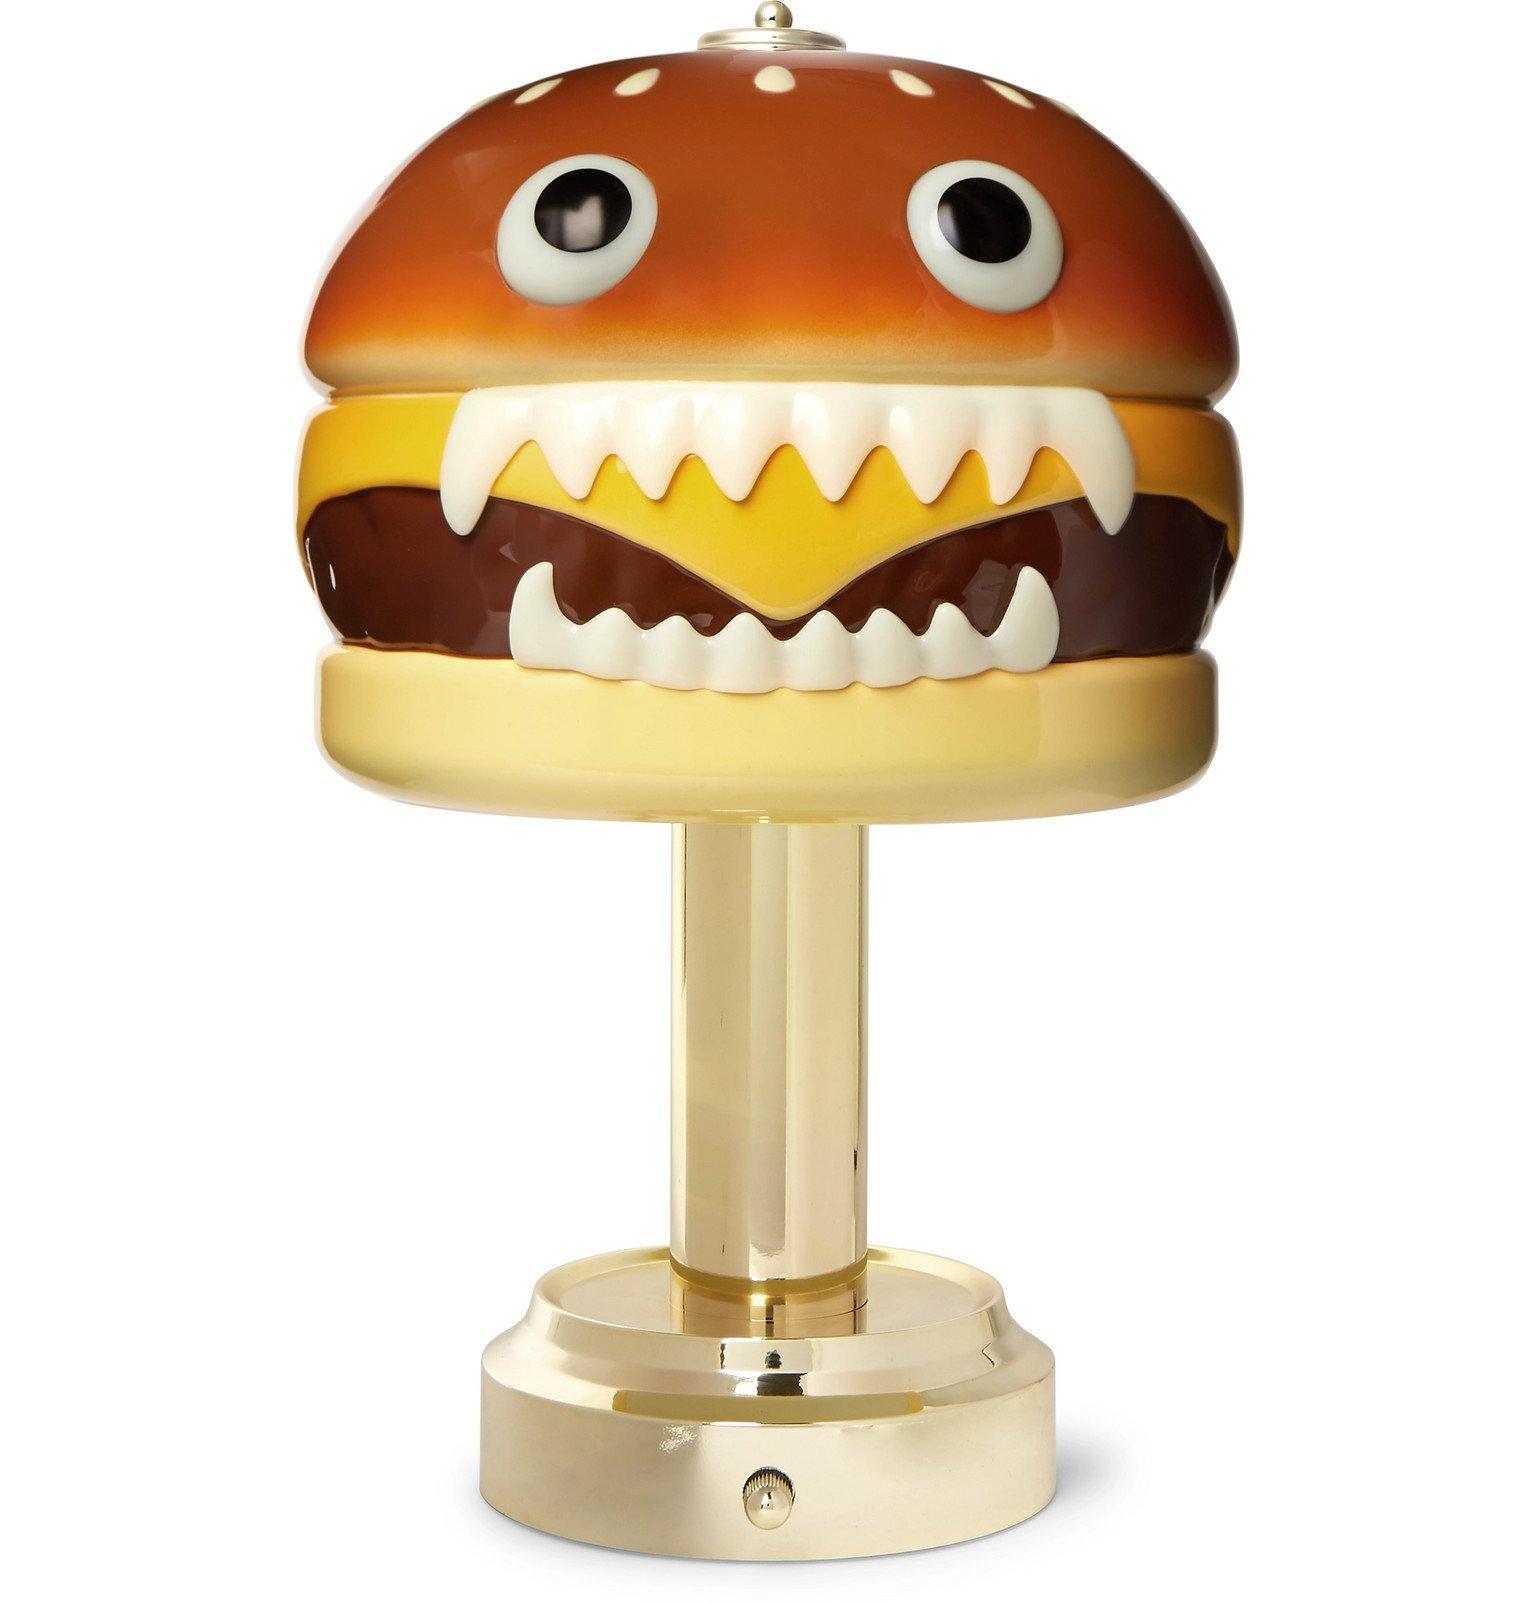 Undercover - Medicom Hamburger Lamp - Gold